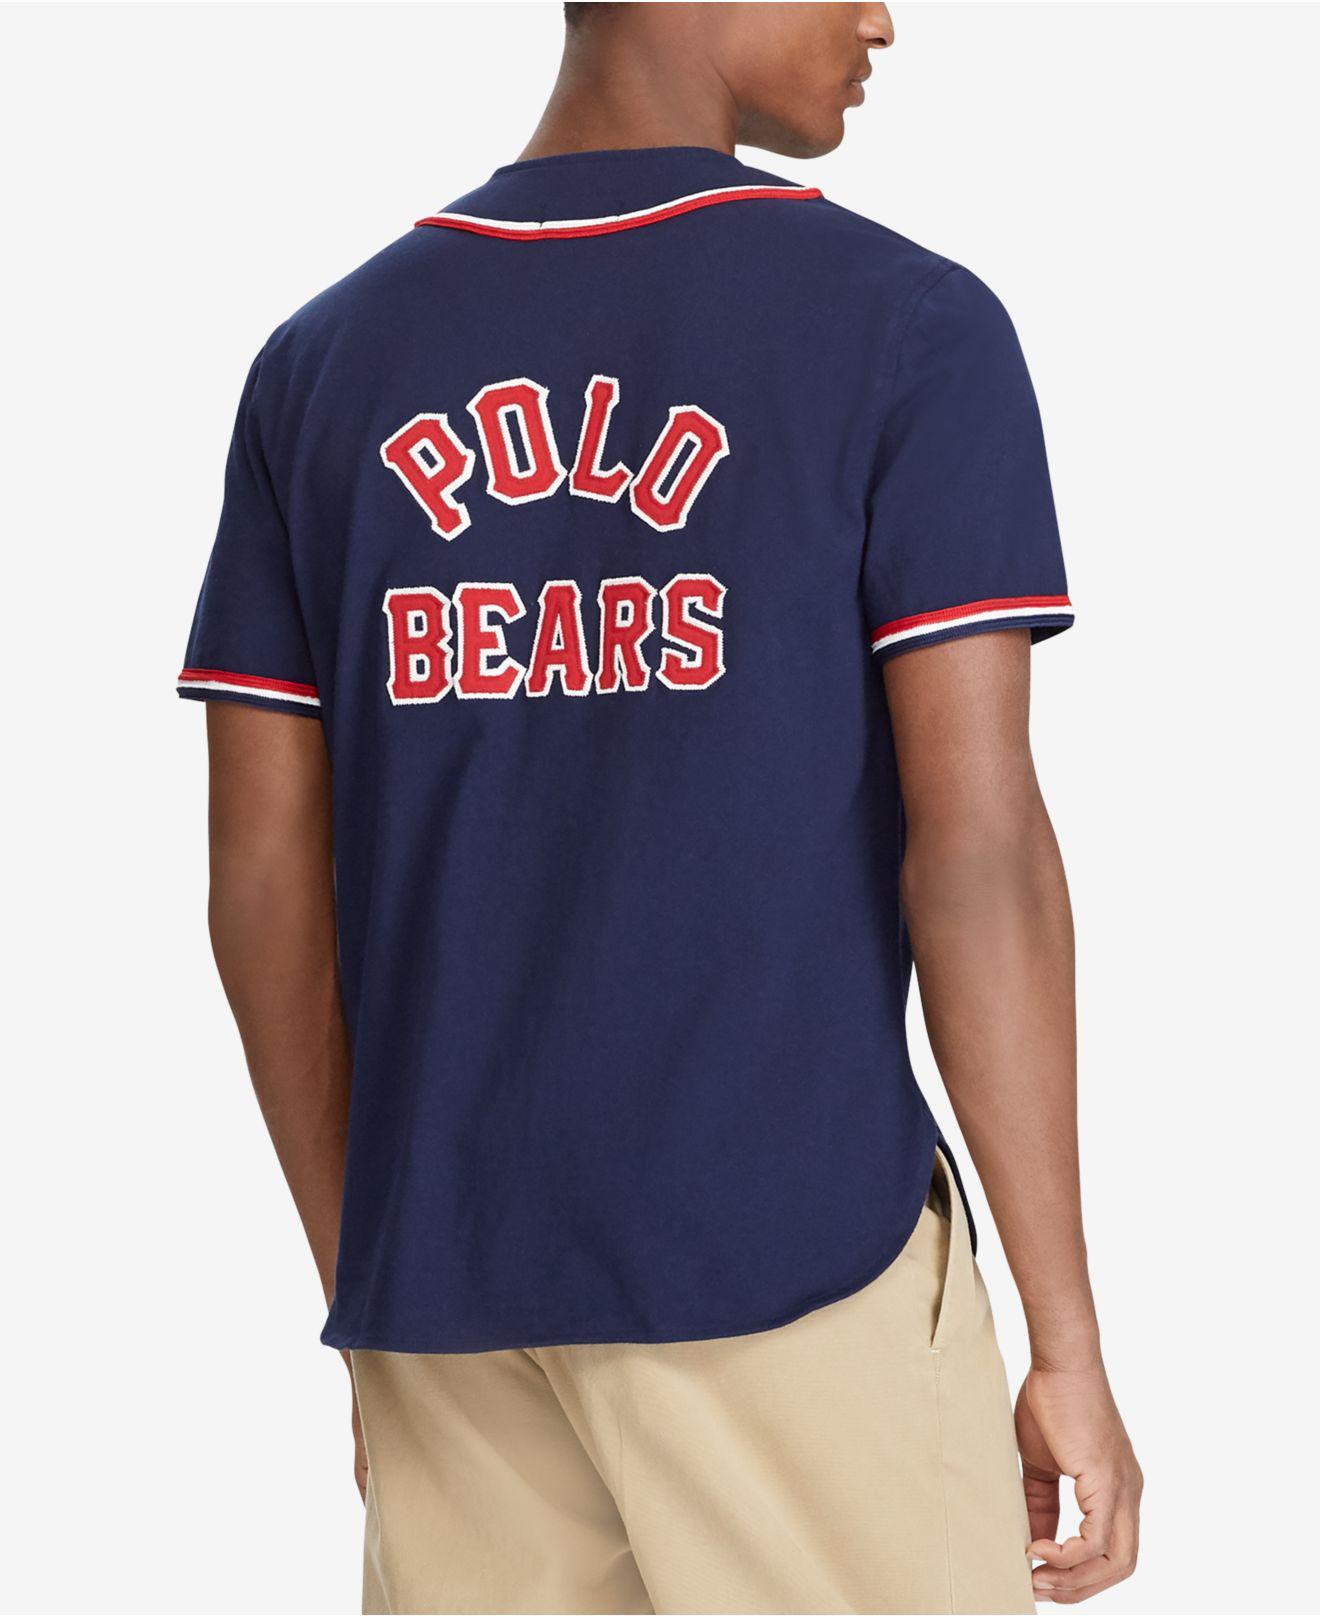 9c8e8f42b06 Polo Ralph Lauren Polo Bear Baseball Jersey in Blue for Men - Lyst